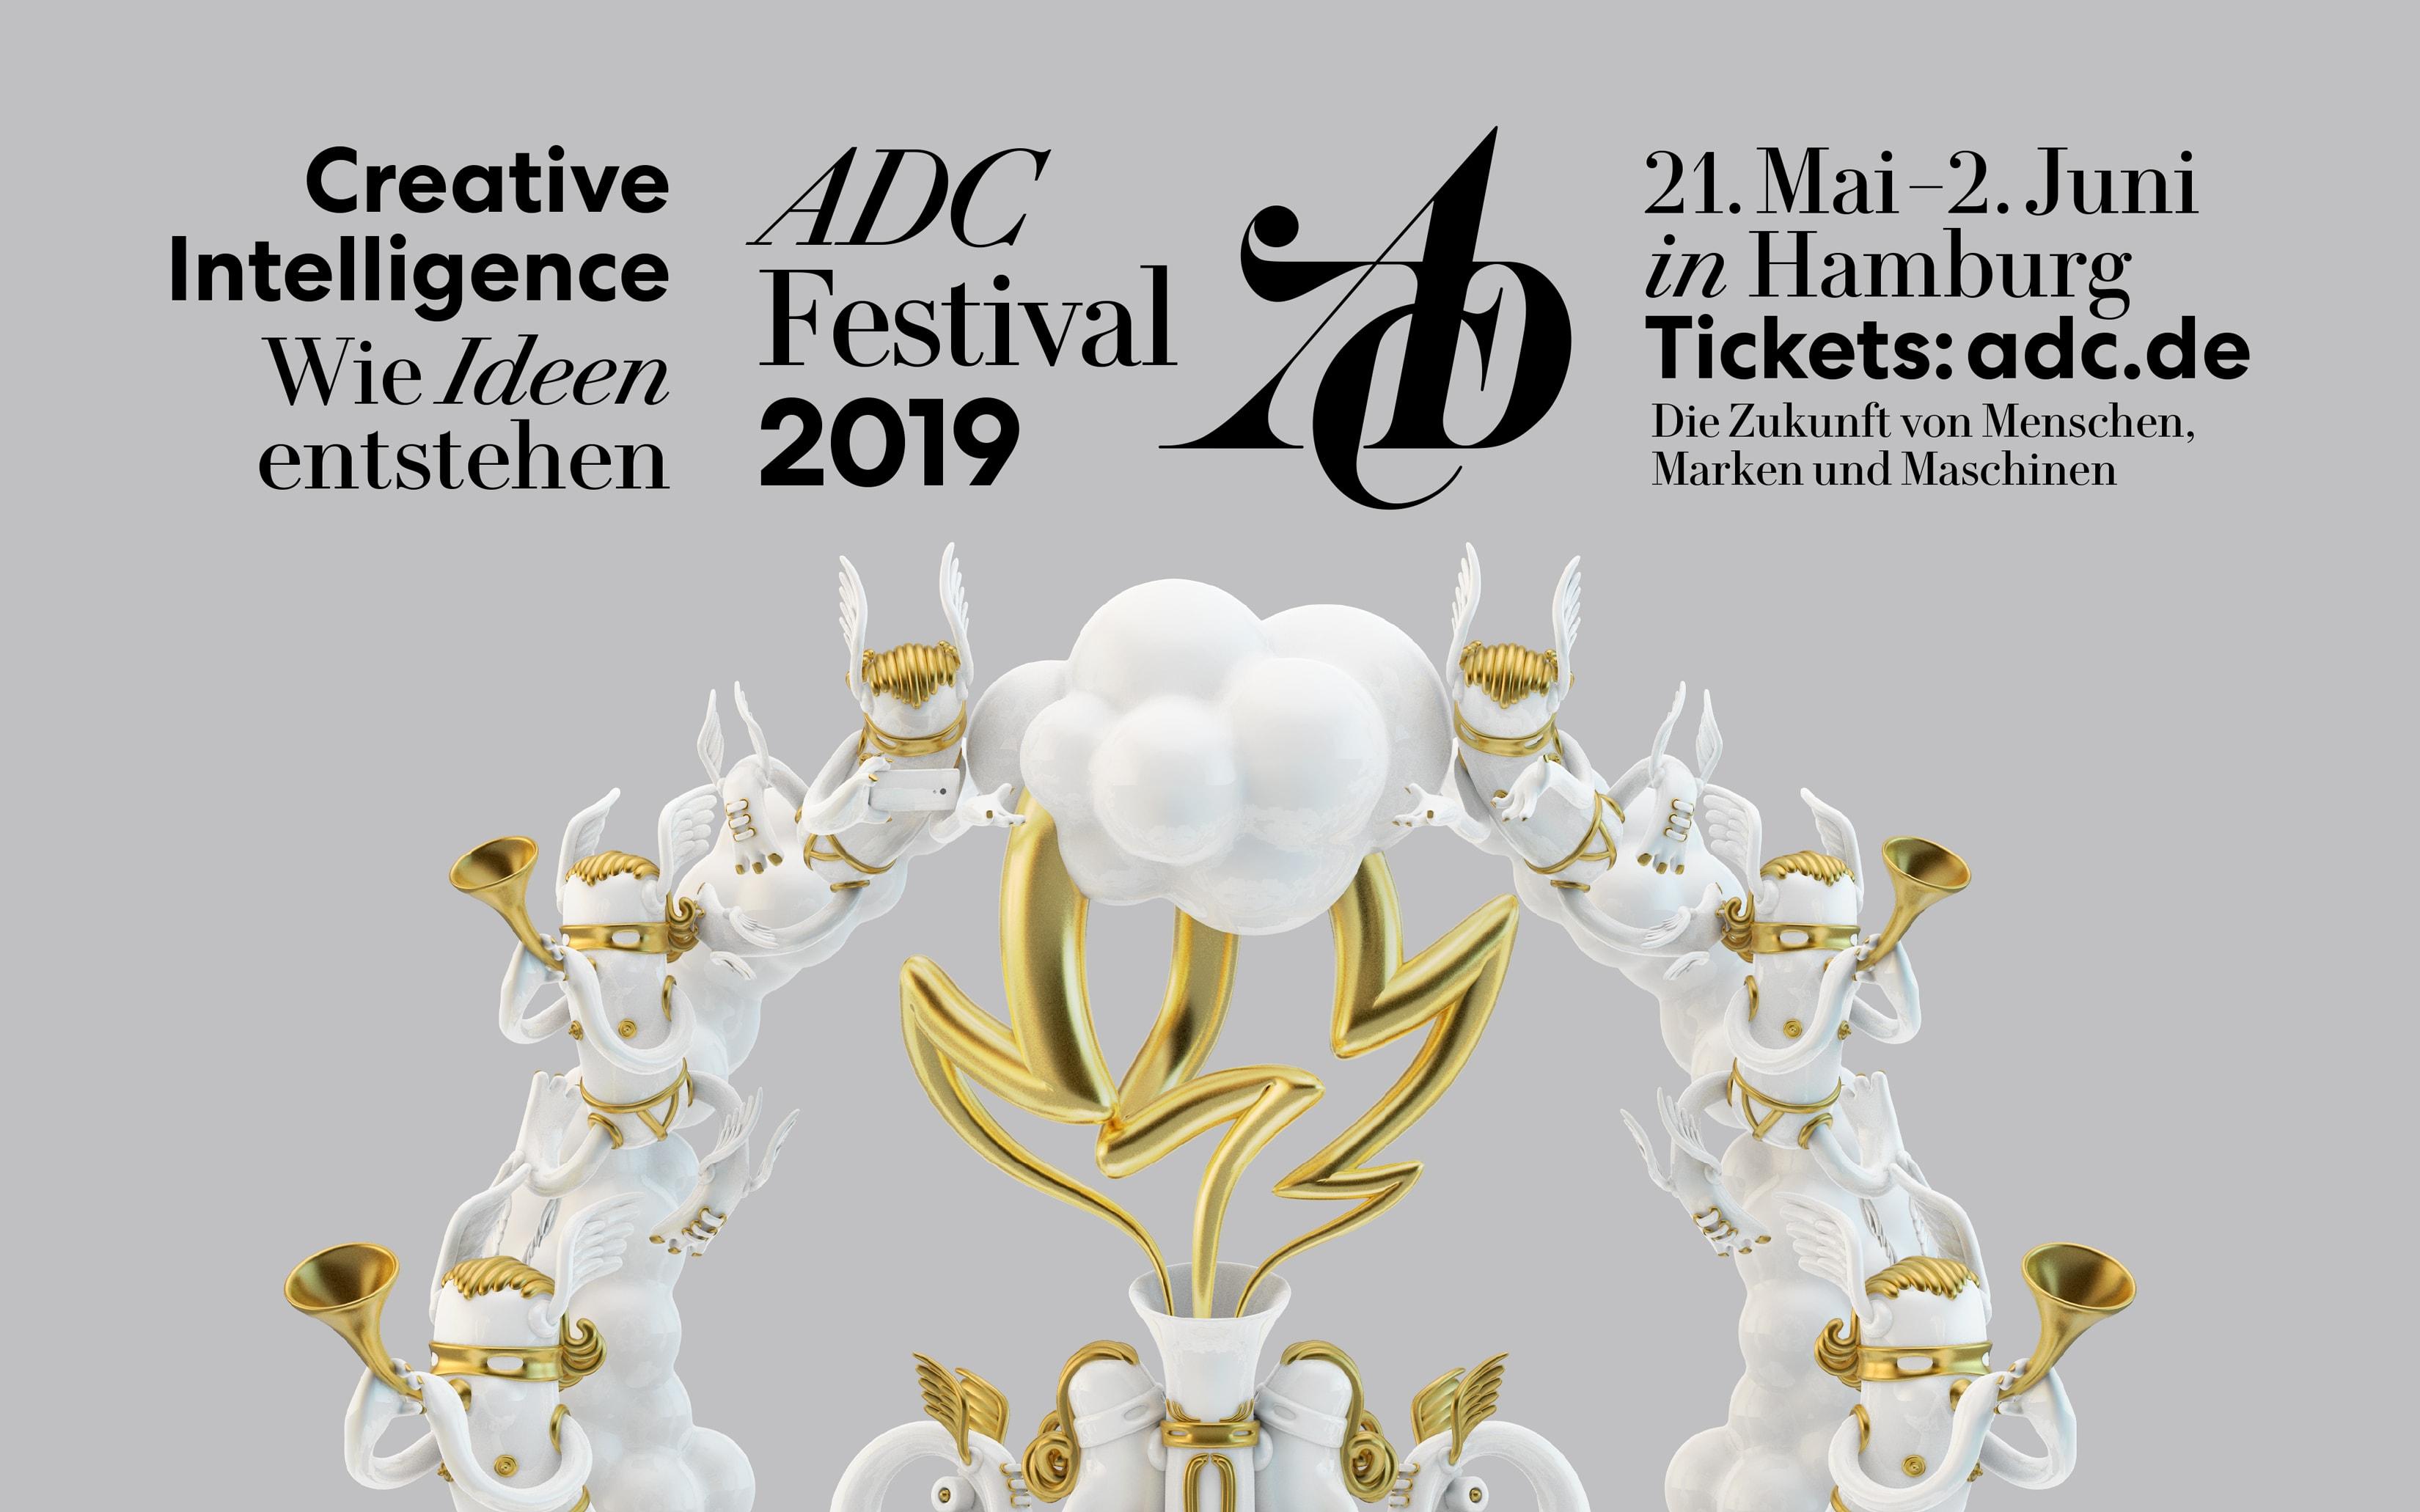 Bureau Johannes Erler – Beim Warm-up zum ADC Festival